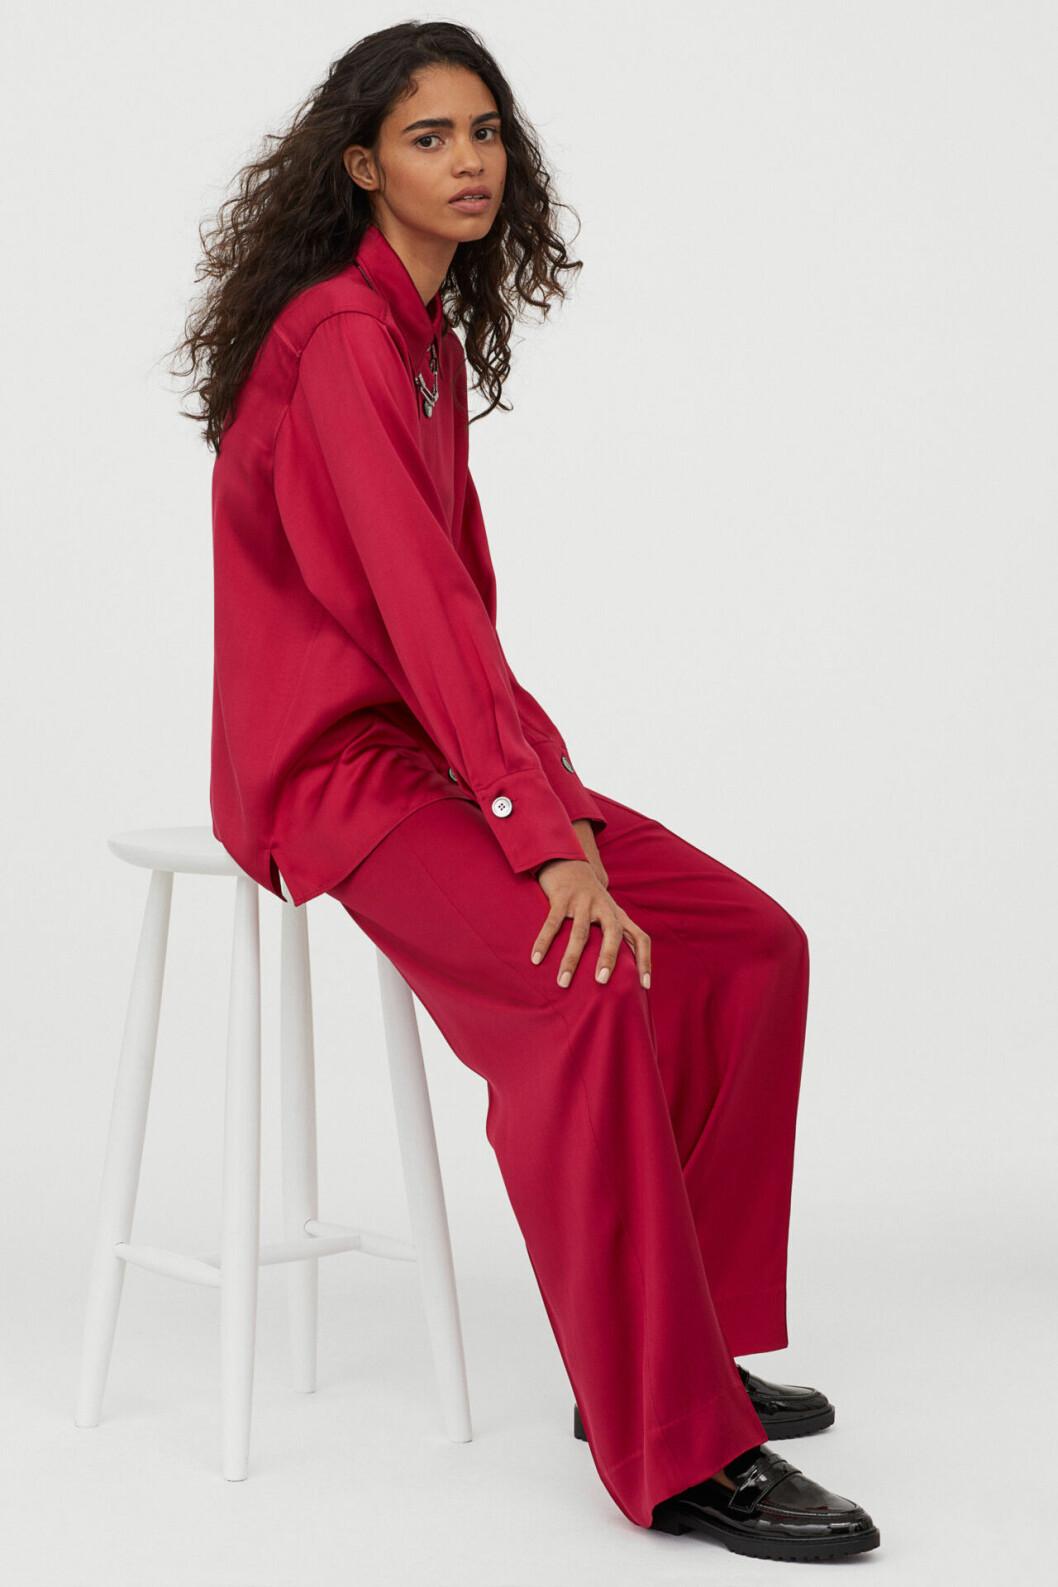 Matchande set: Rosa skjorta i silke